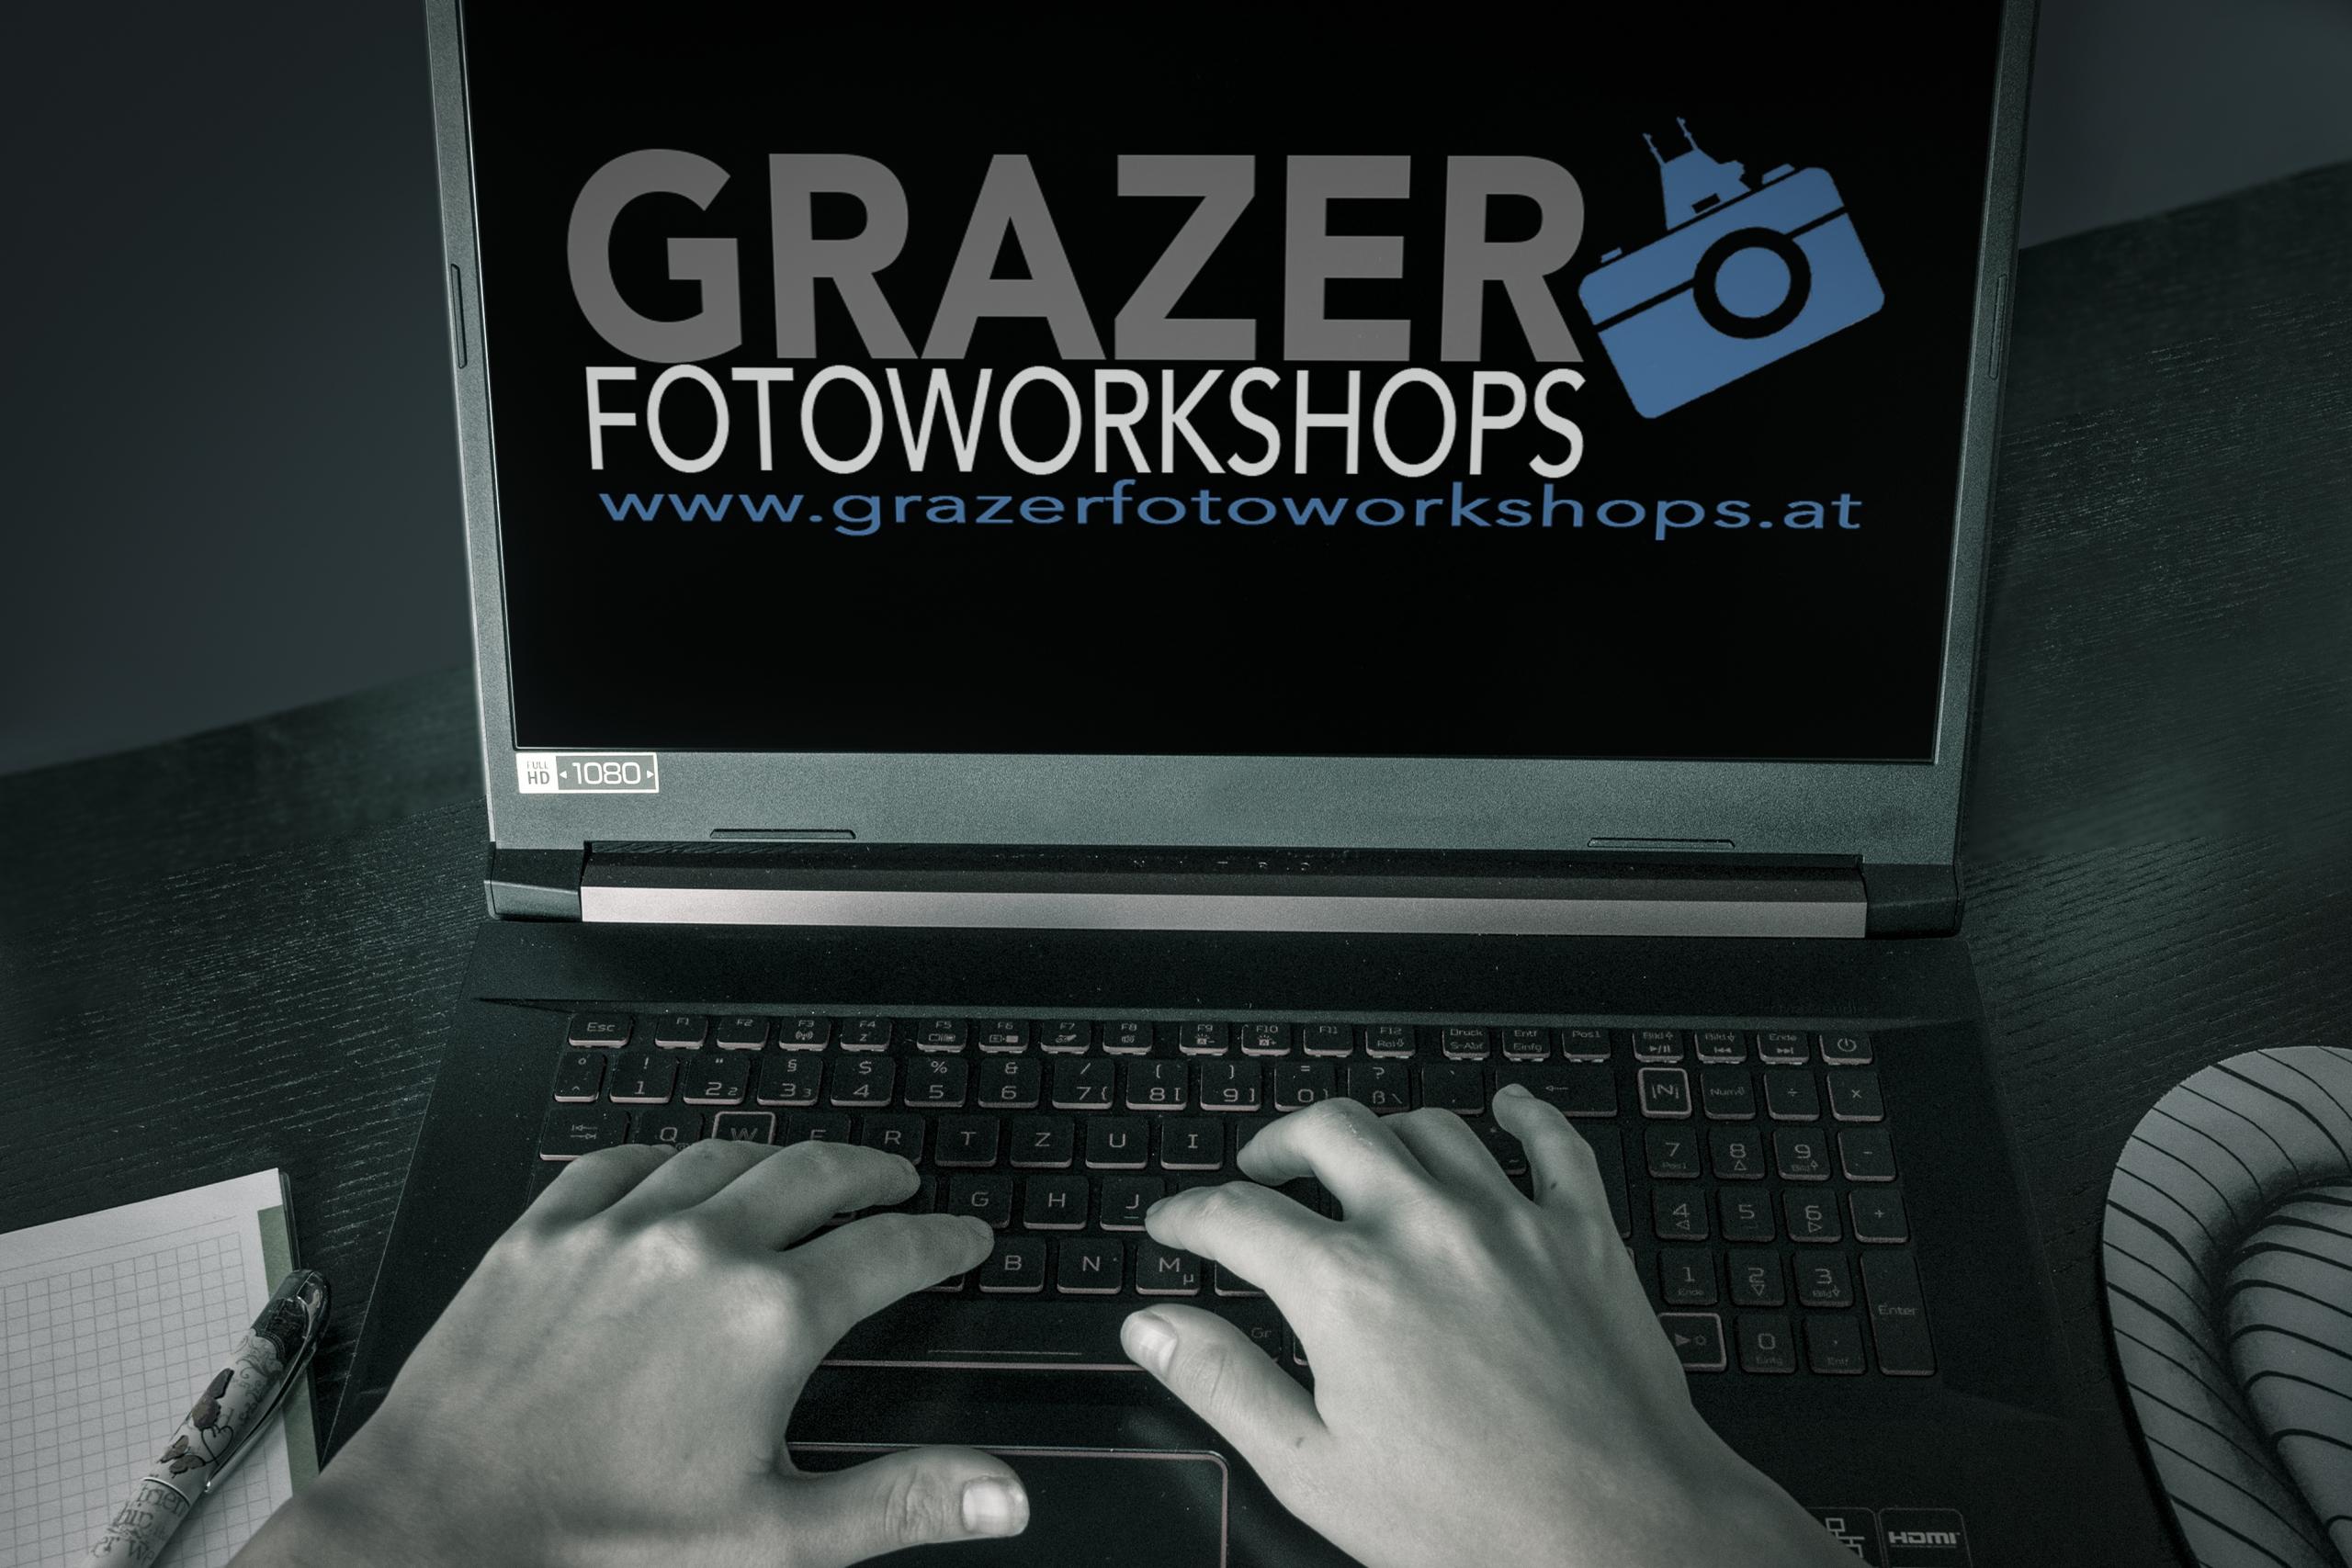 Fotokurs Online. Online Fotokurse. Fotografieren lernen